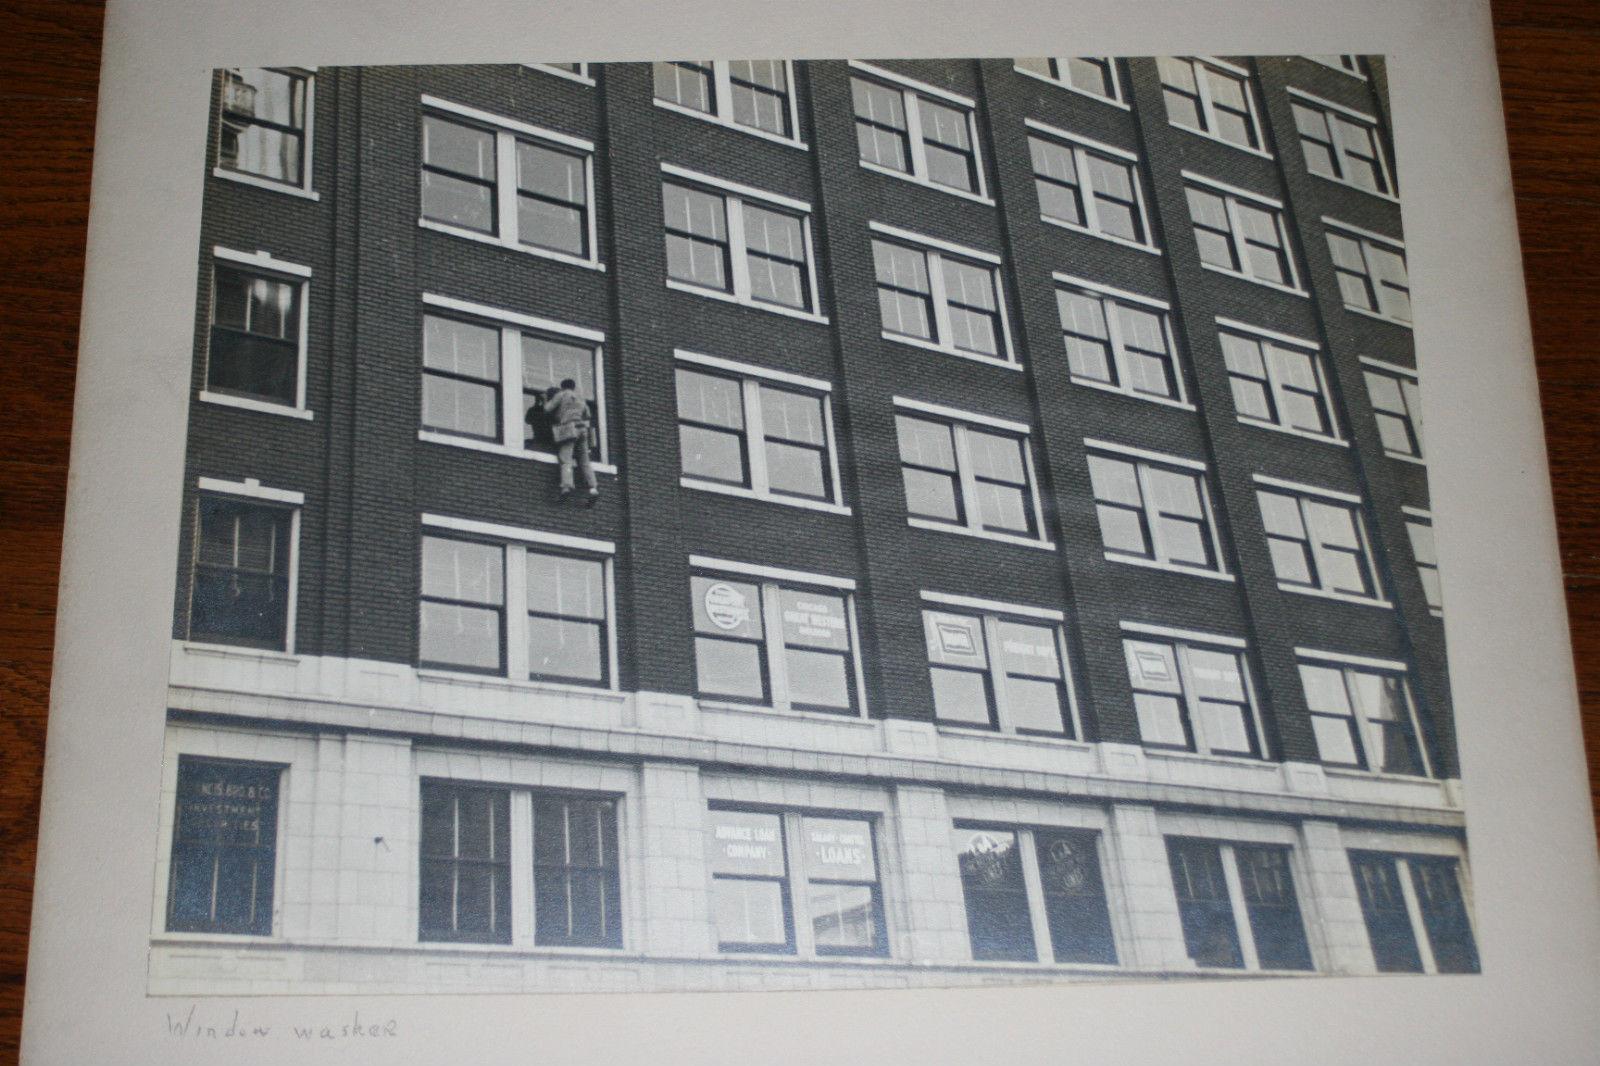 BLACK & WHITE SILVER GELATIN PHOTOGRAPH TITLED WINDOW WASHER